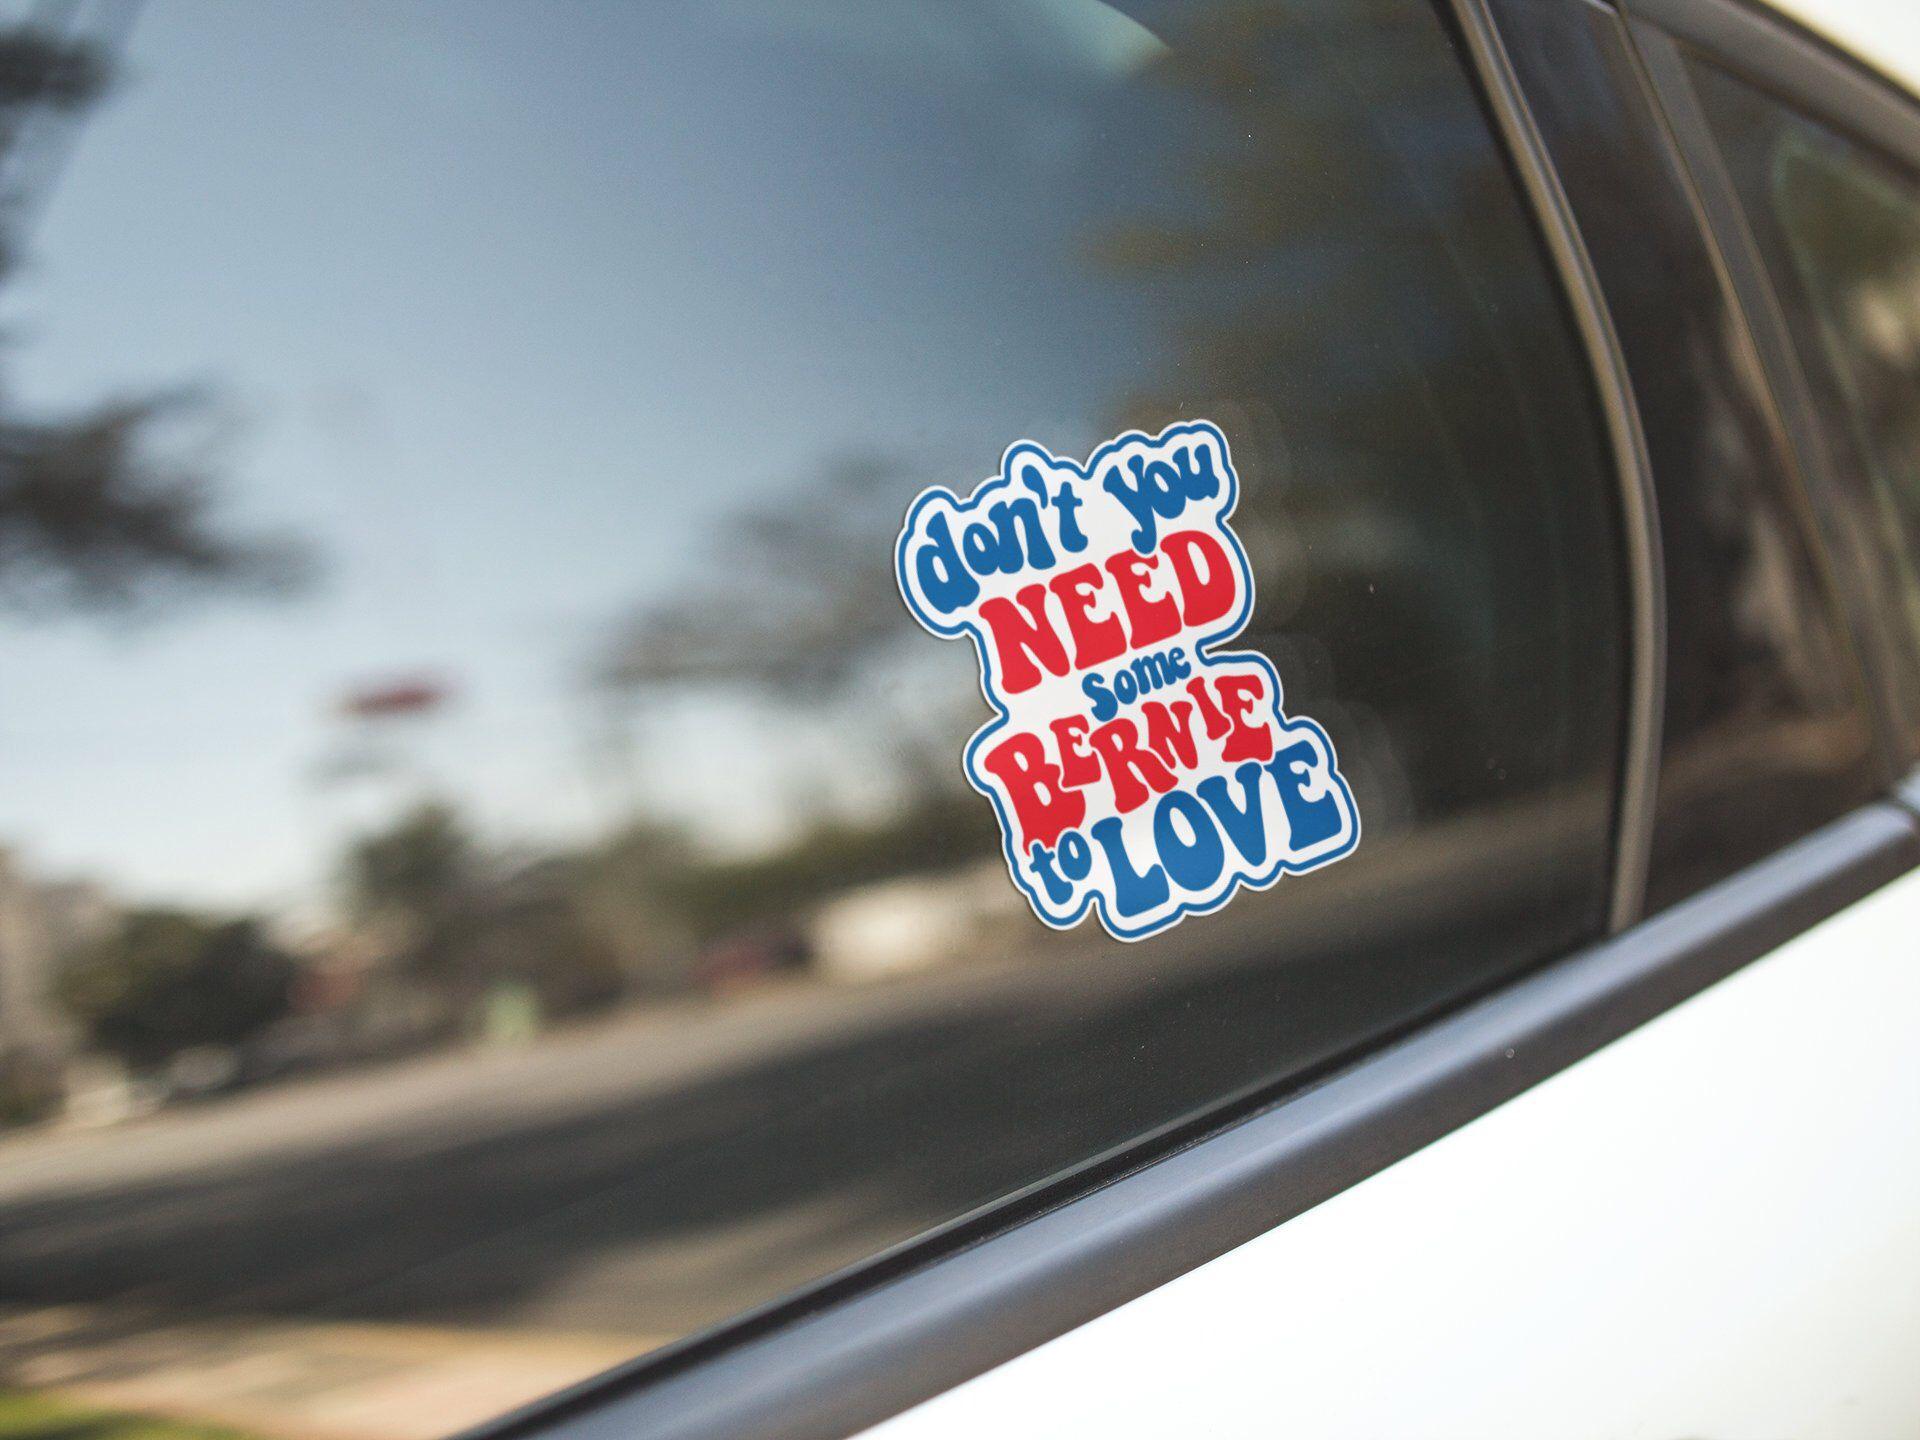 Bernie Sanders 2020 For President Vinyl Sticker Car Truck Window Decal Bumper